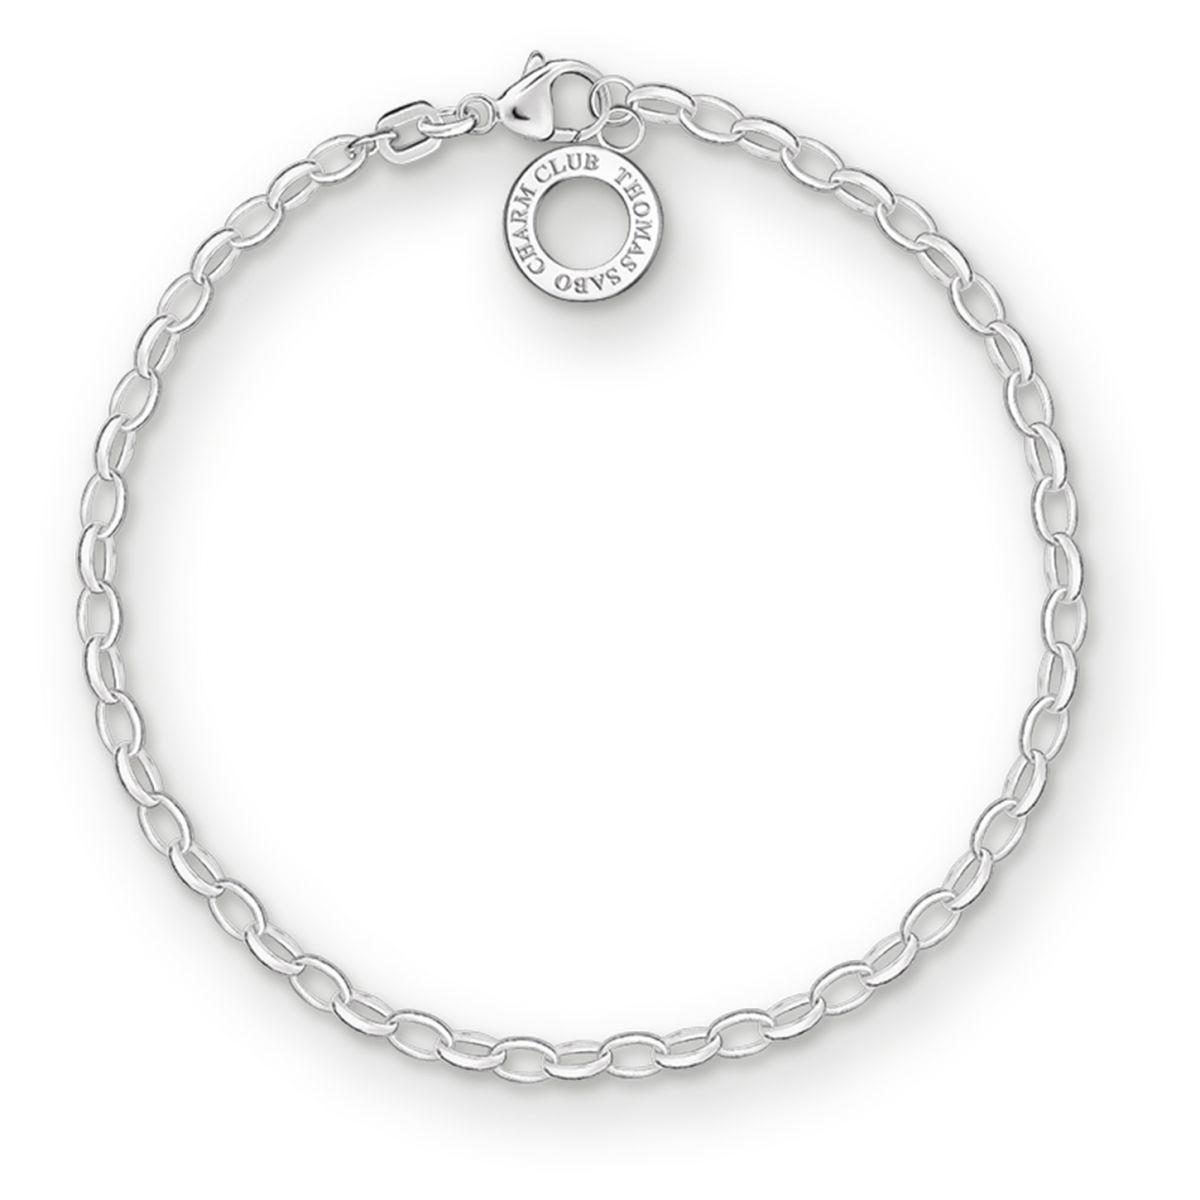 Thomas Sabo Ladies Necklace for Charms X0002-001-12 I7Jar8lkkx